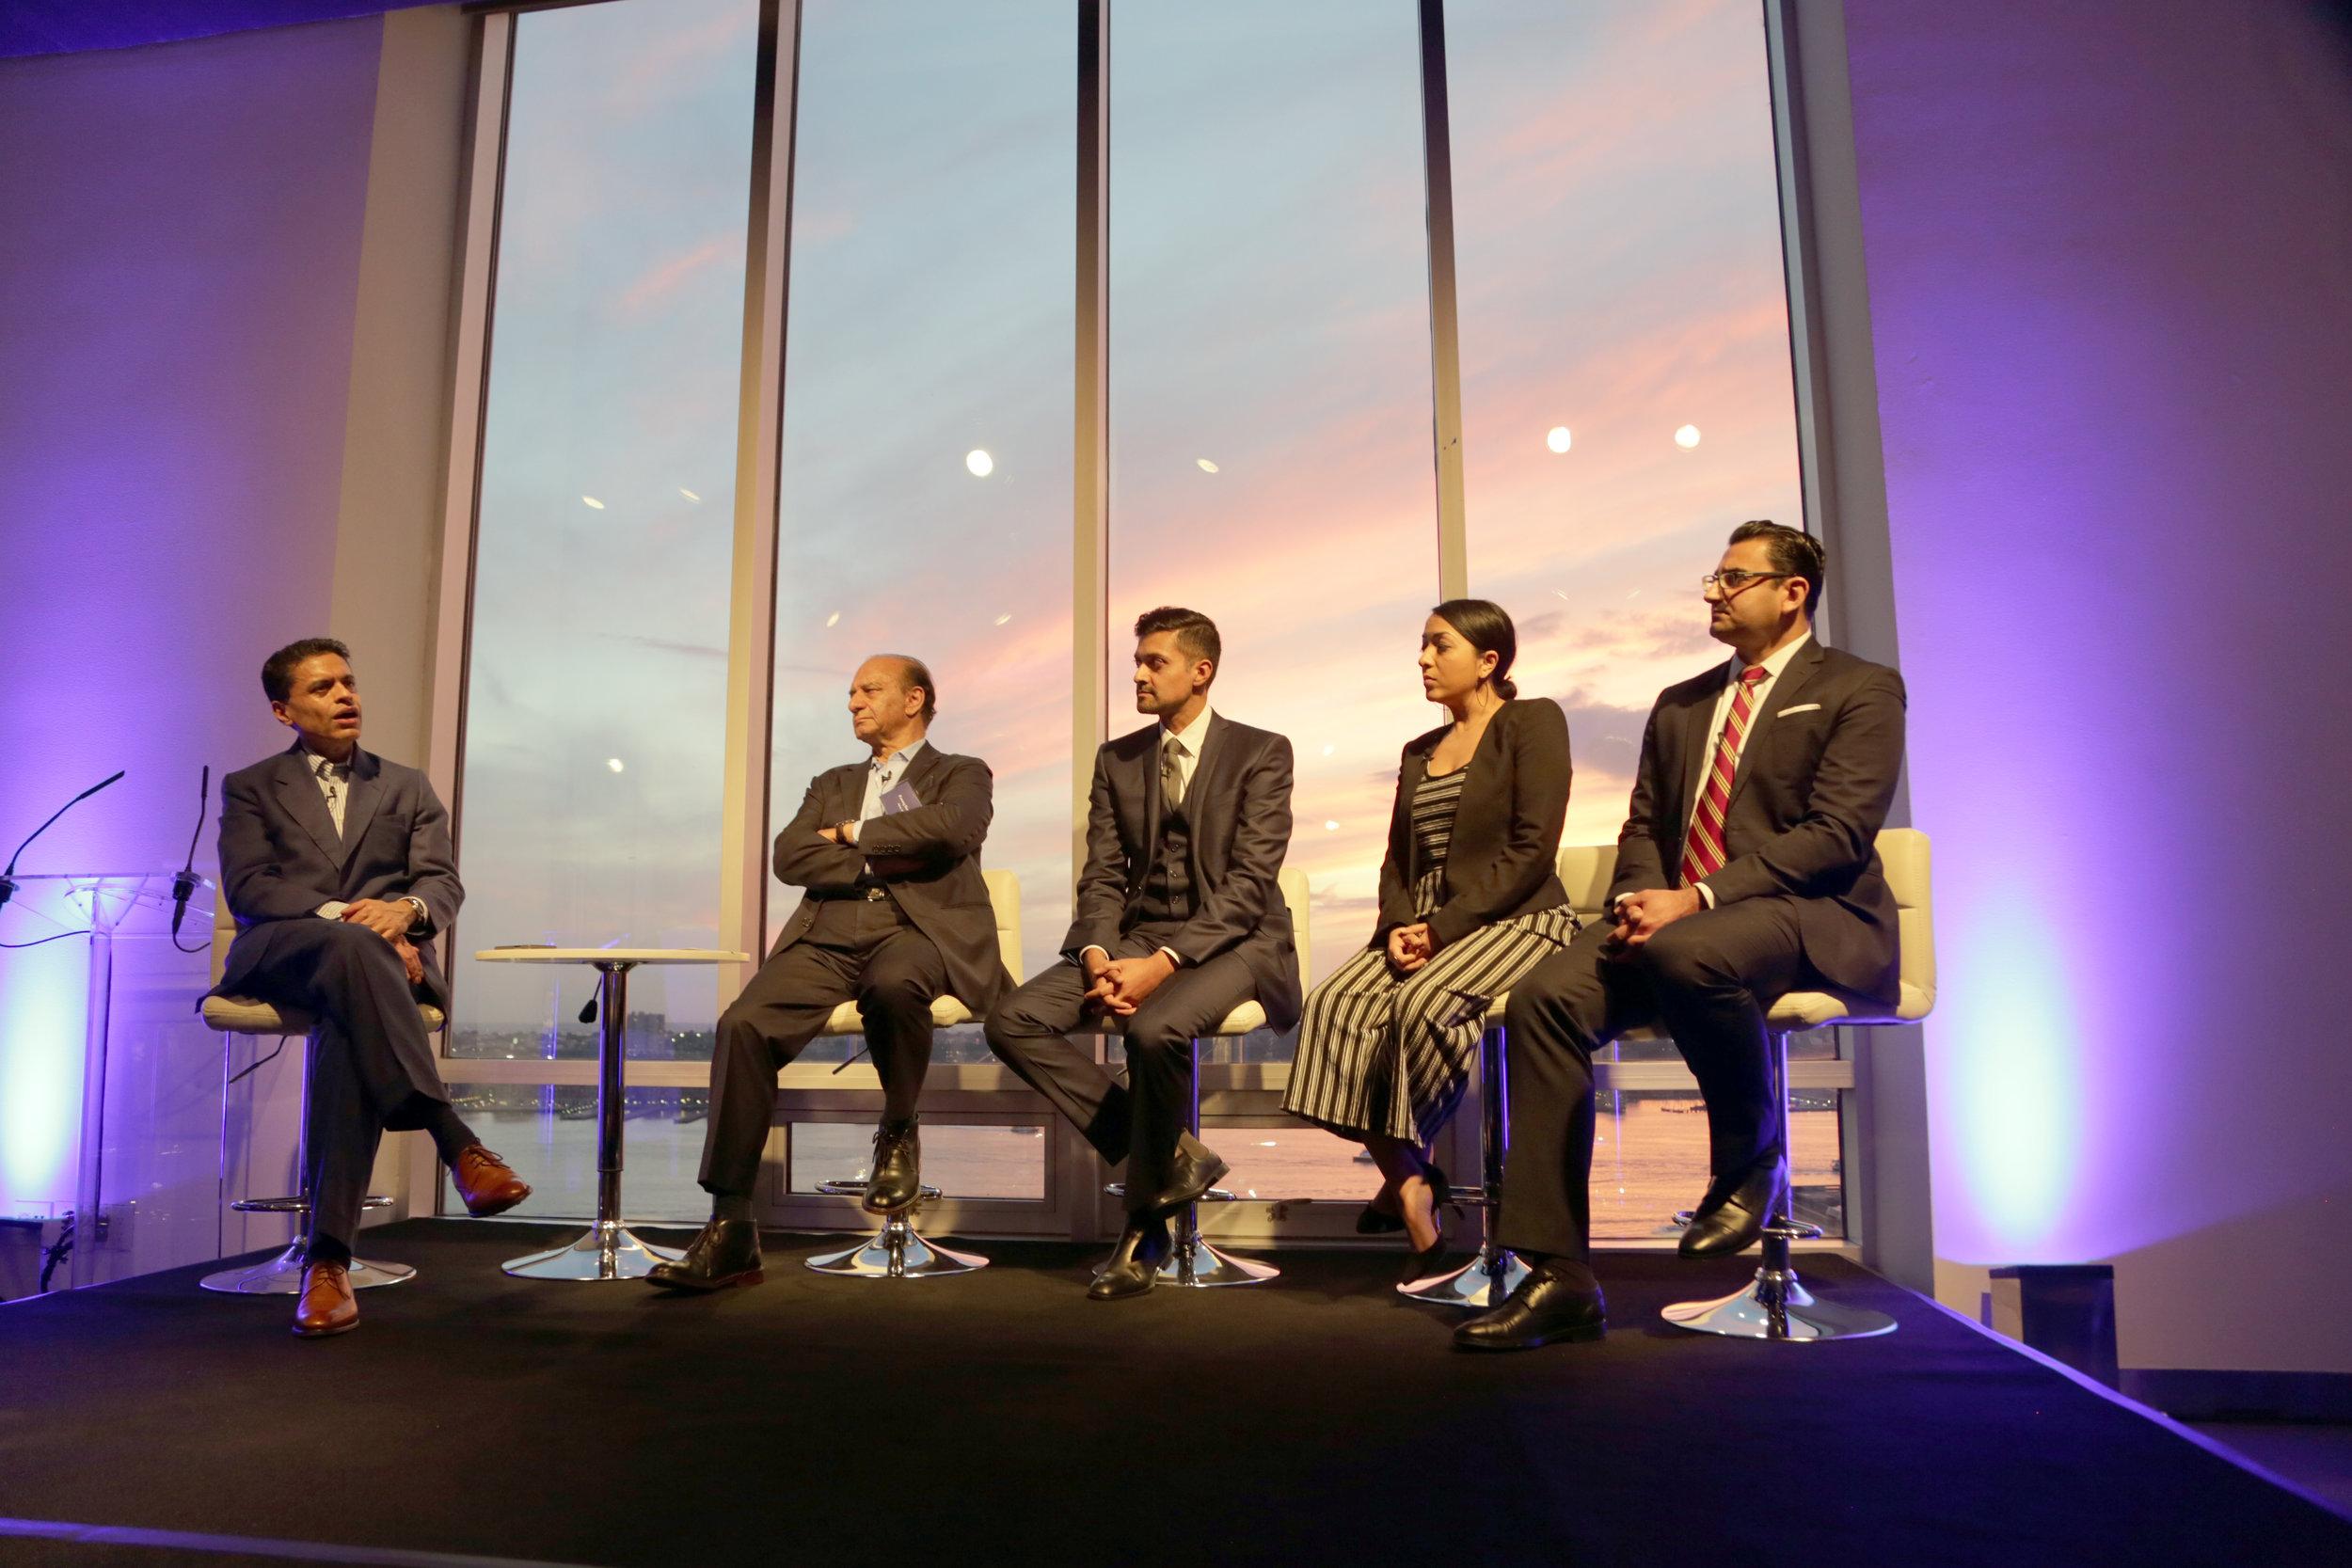 CNN's Fareed Zakaria moderates a panel at a McKinsey event, Summer 2018.